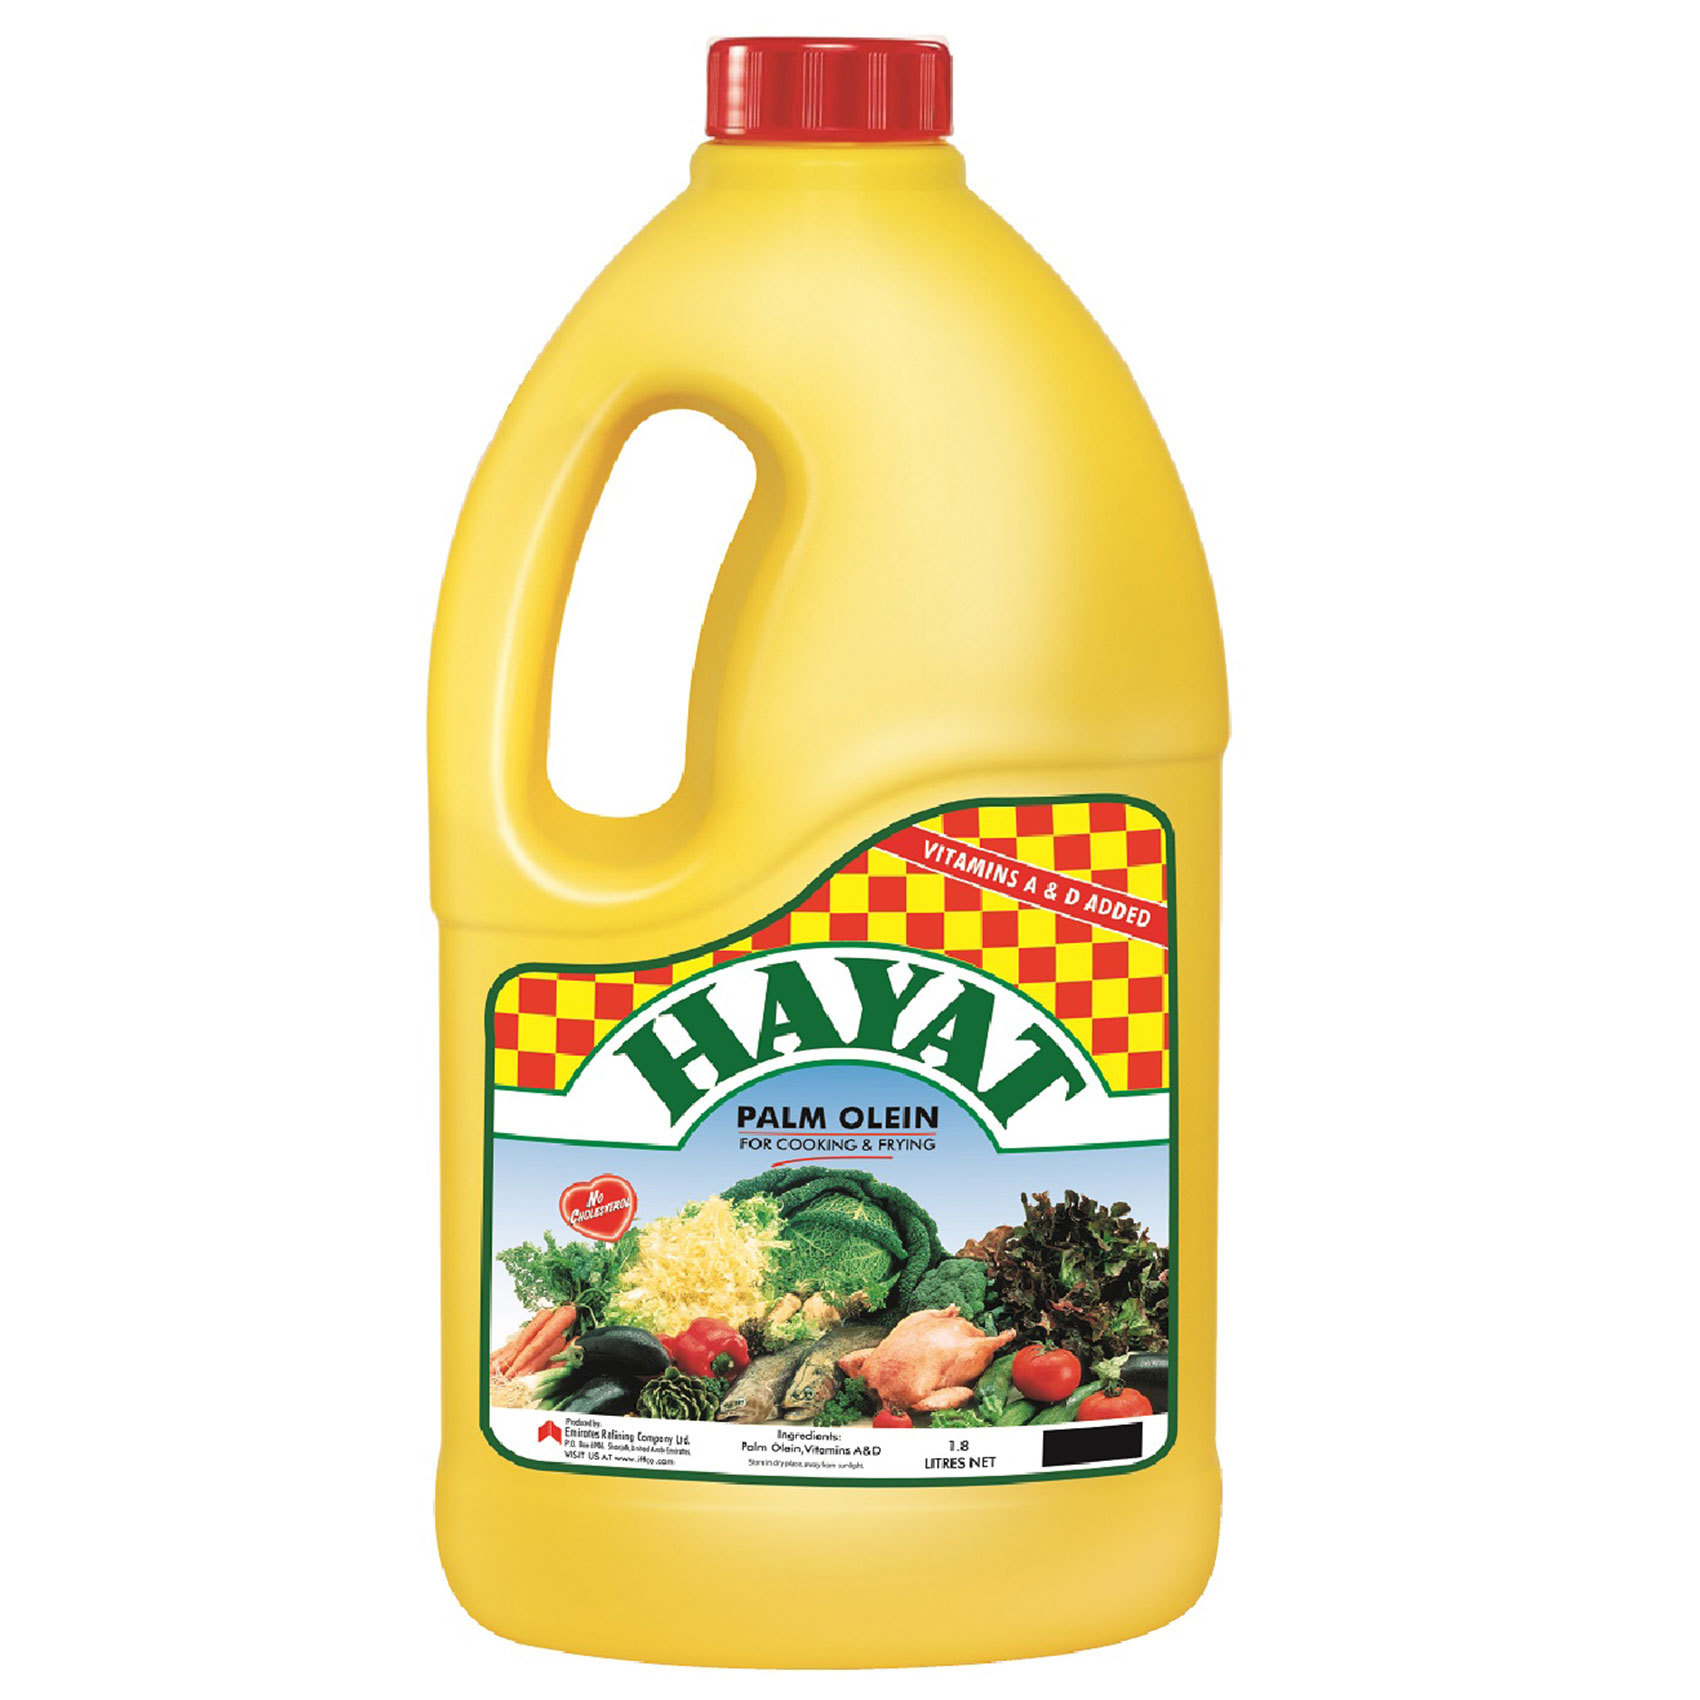 HAYAT VEGETABLE OIL 1.8L